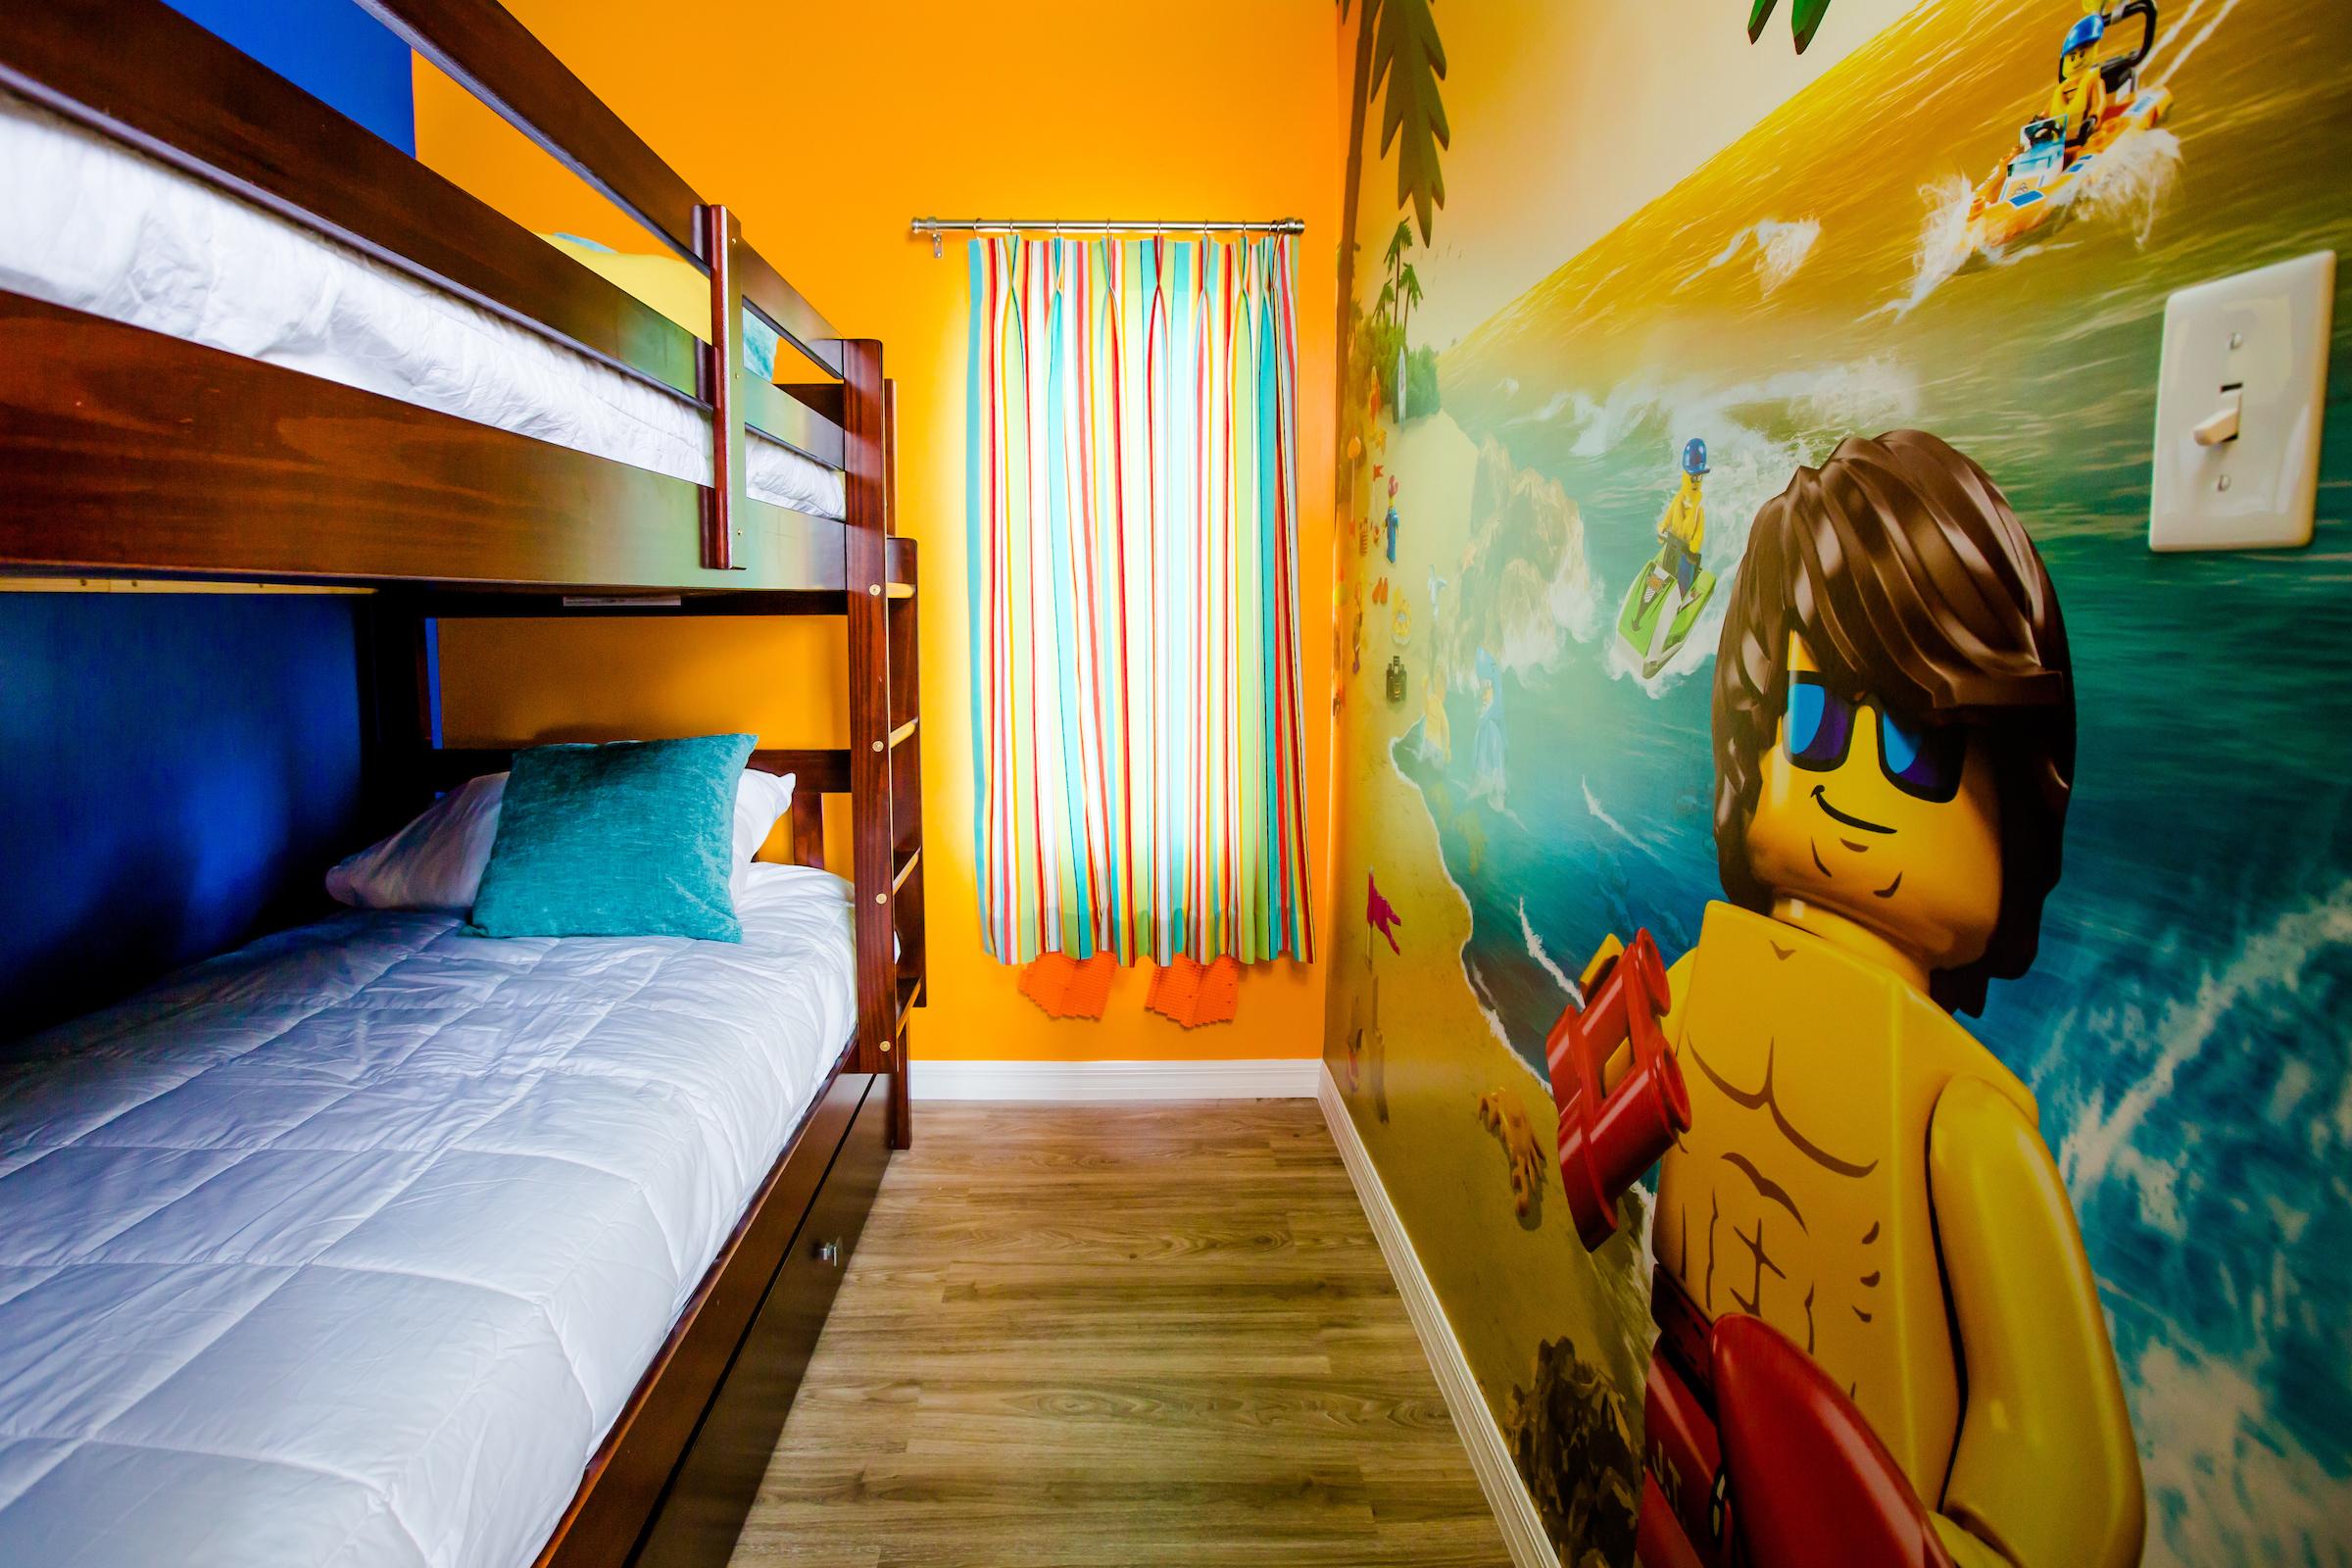 Legoland Beach Retreat previews new bungalows